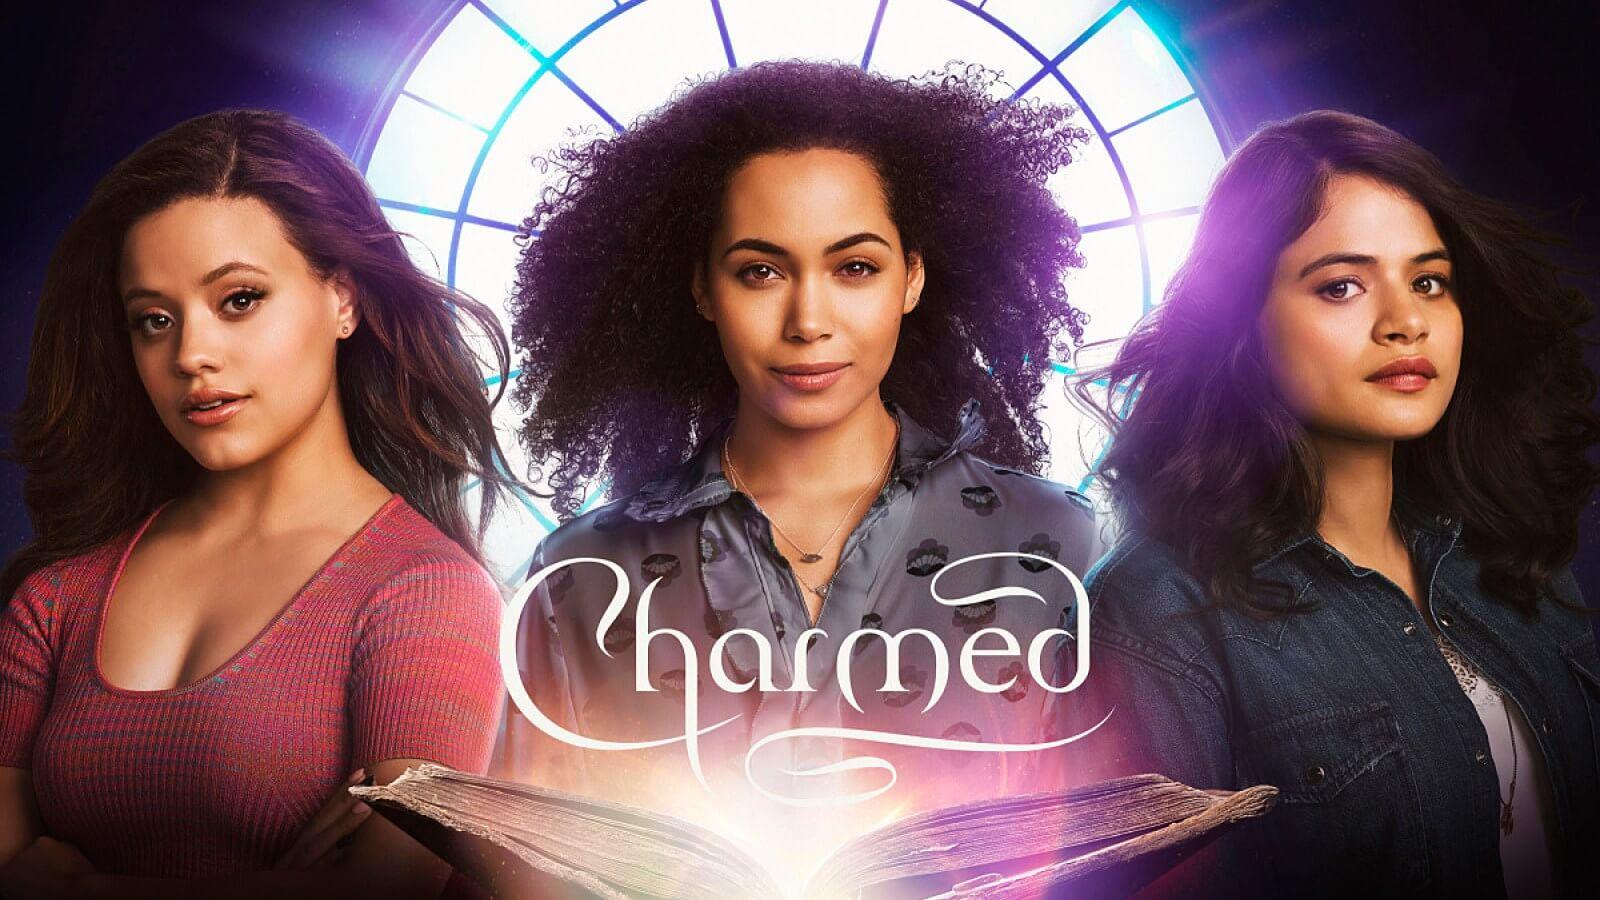 charmed saison 1 uptobox